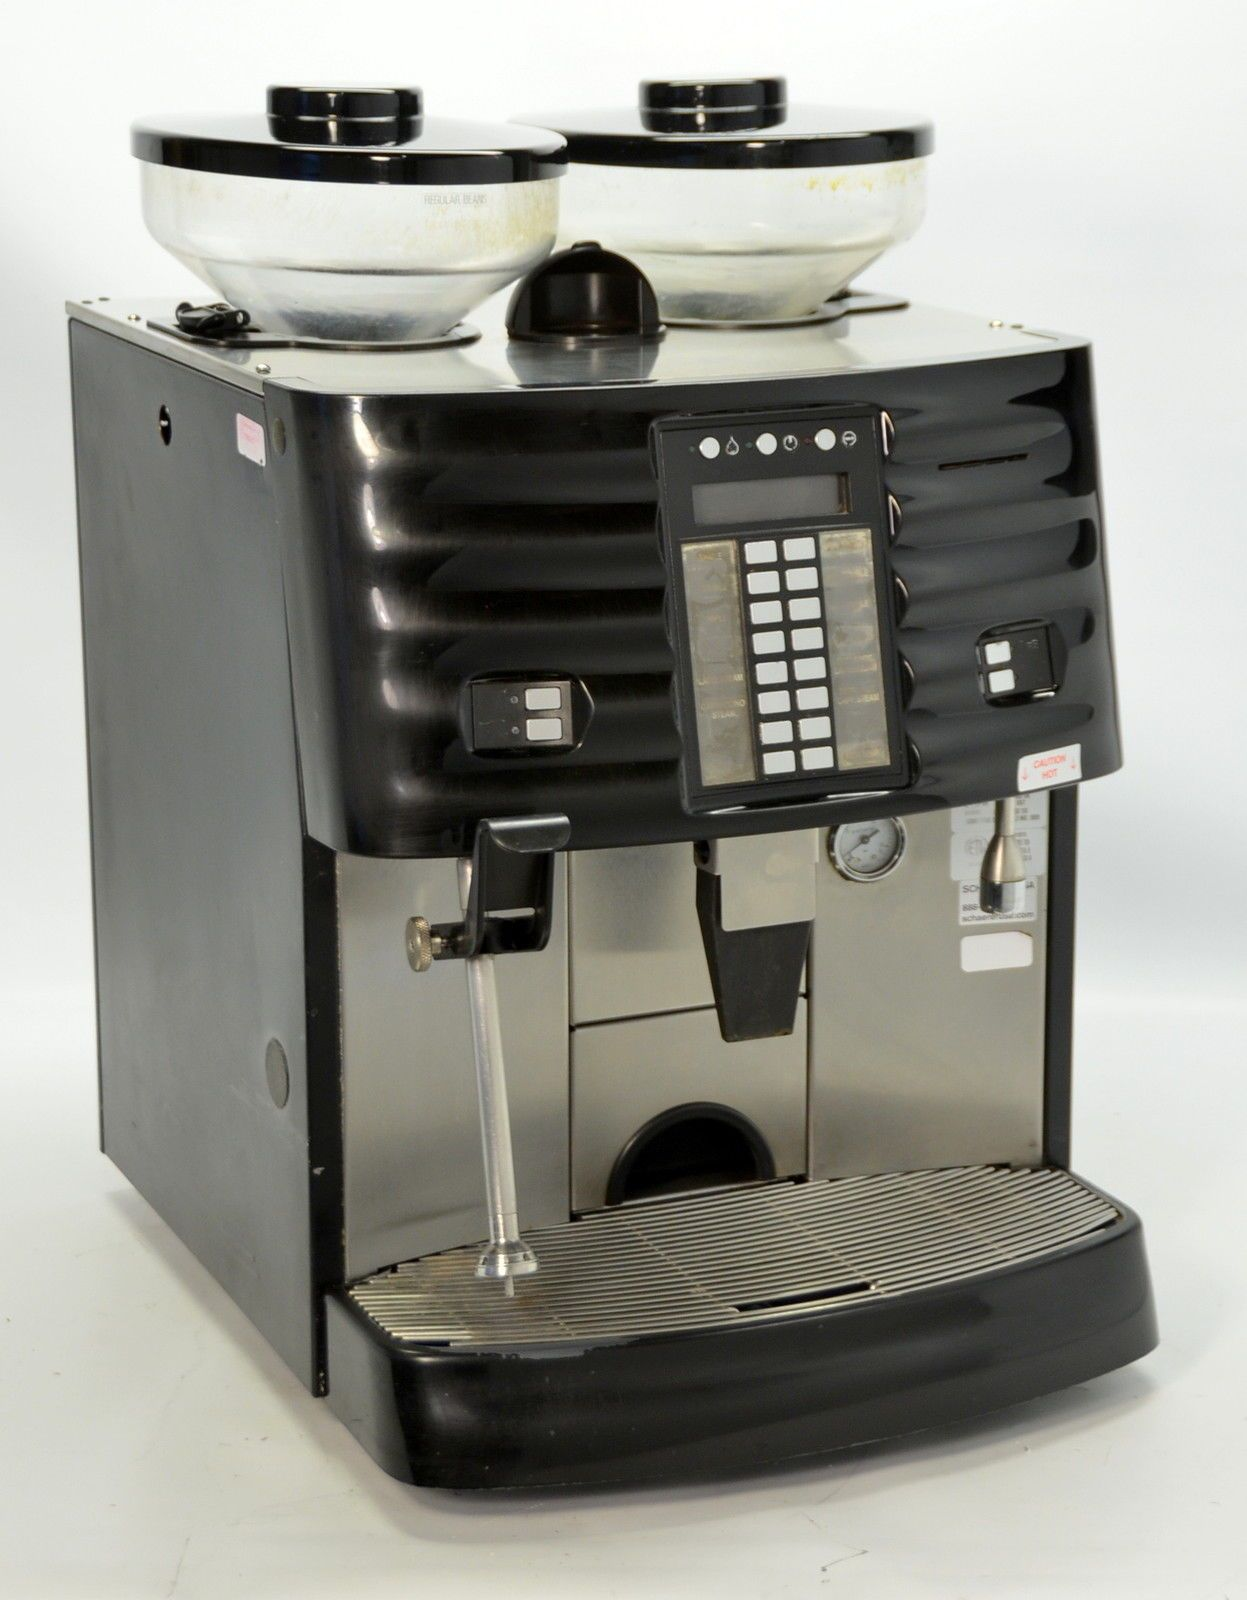 Schaerer Coffee Art Plus Espresso Machine Nearly new